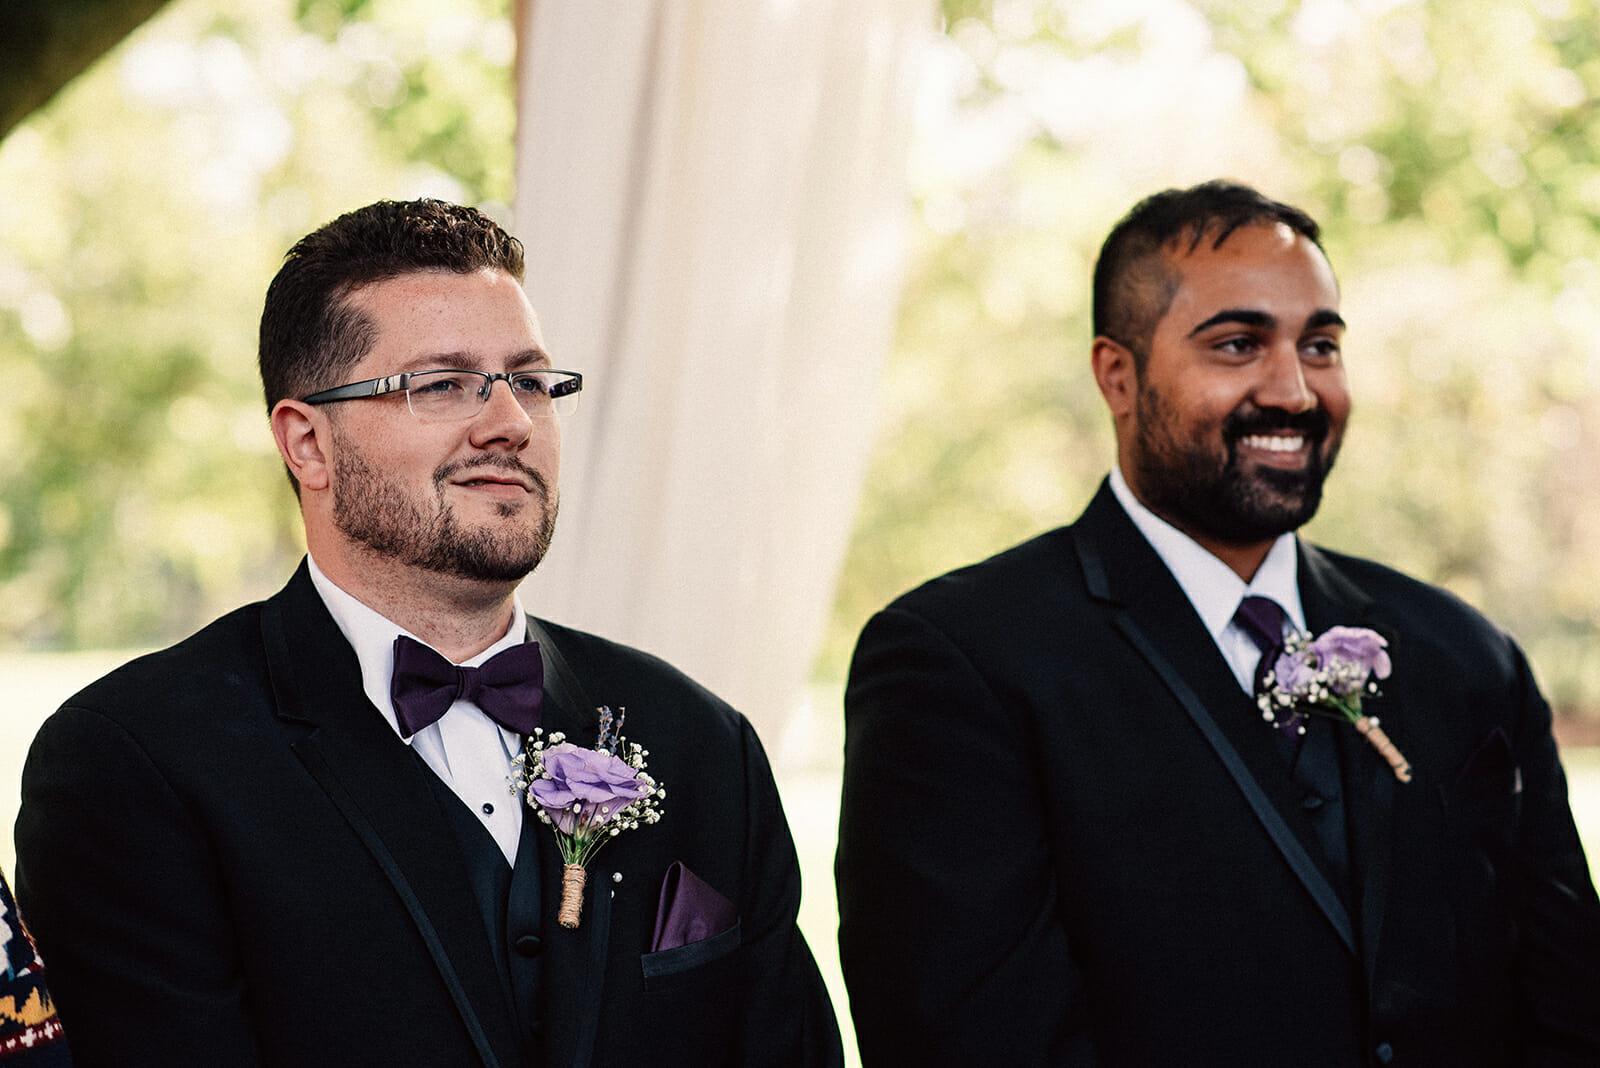 groom smiles while watching bride walk down aisle